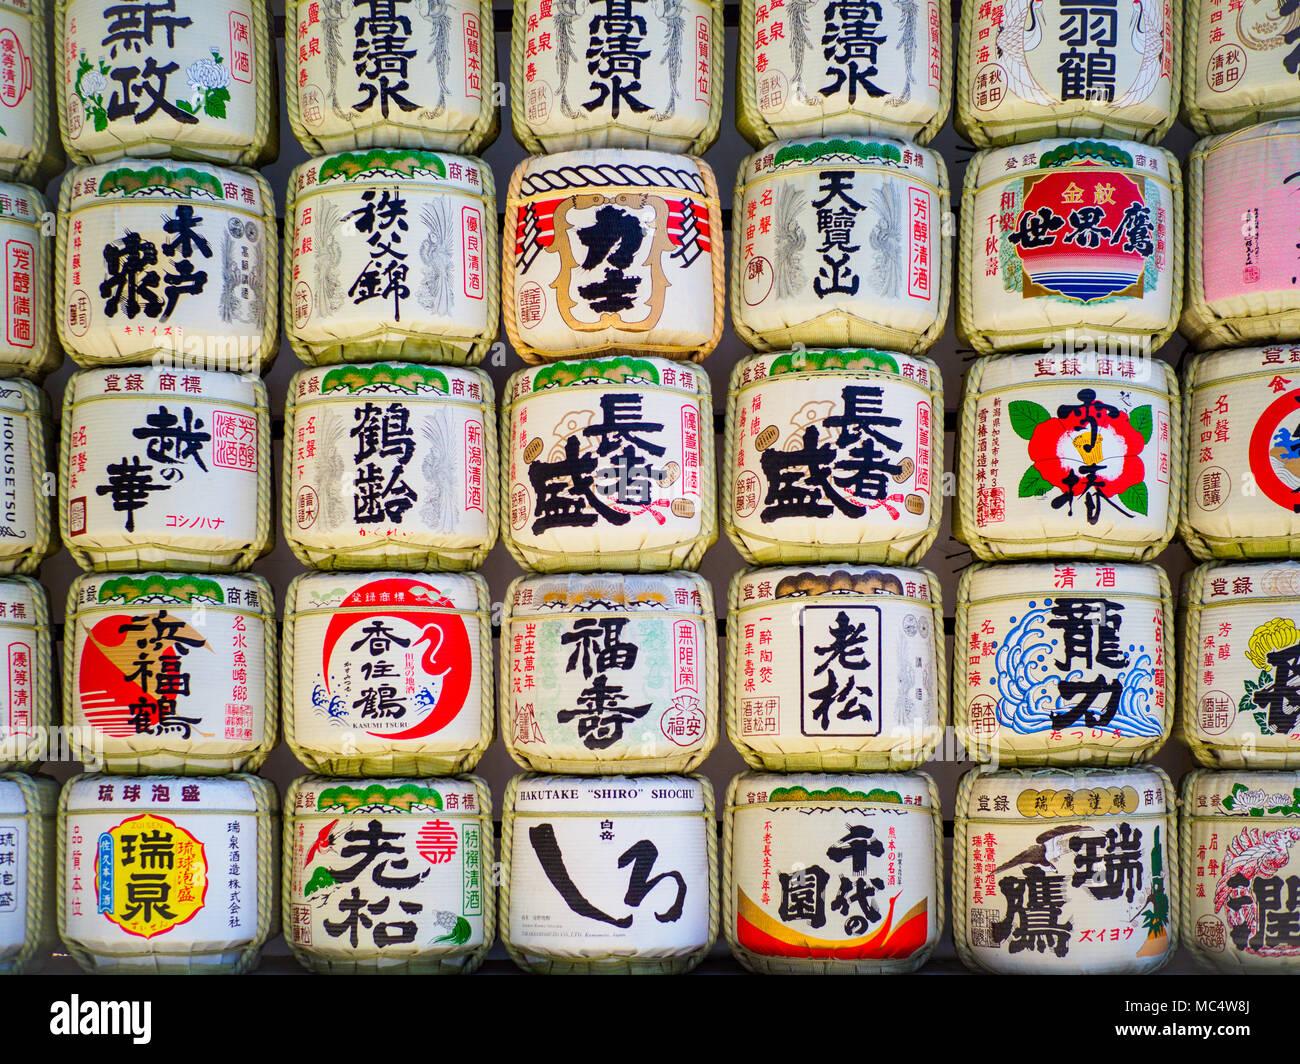 Motivi di barili al Meiji Jingu a Tokyo Giappone Immagini Stock